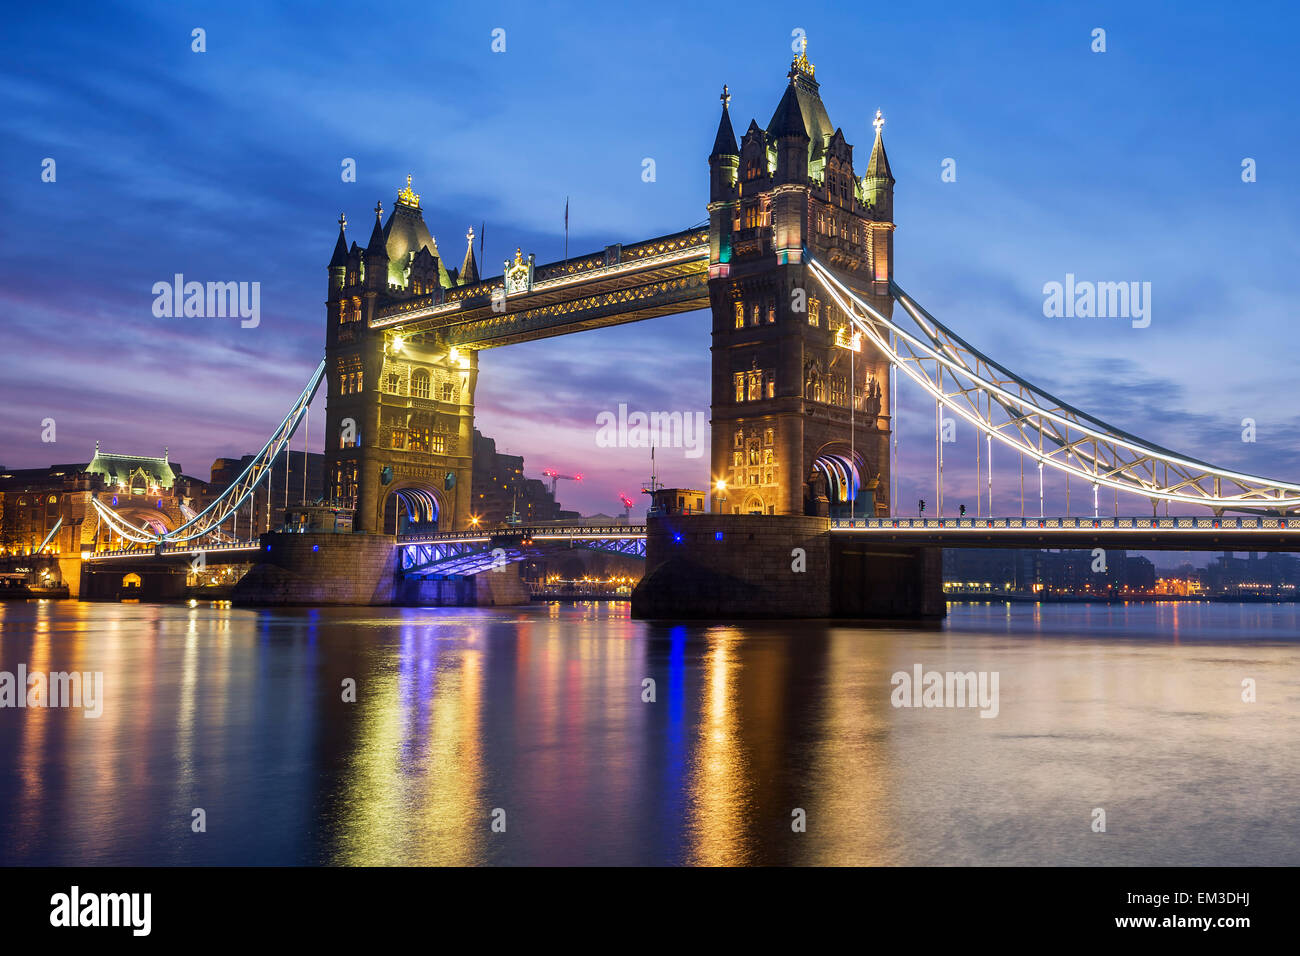 Famoso Tower Bridge in serata a Londra, Inghilterra Immagini Stock